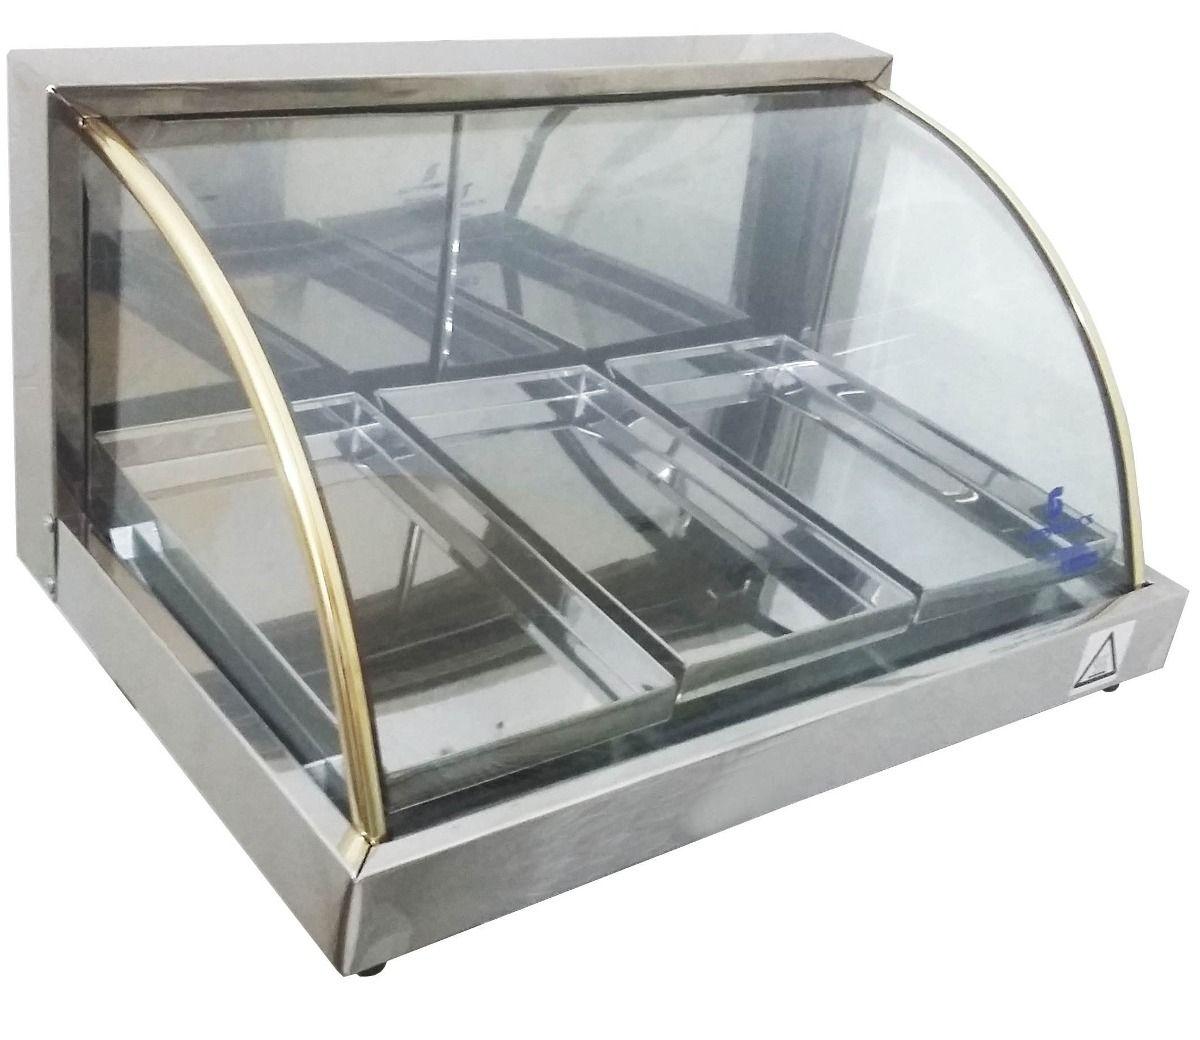 Estufa para salgados elétrica 54cm com 3 Bandejas Supritecs  - Mix Eletro